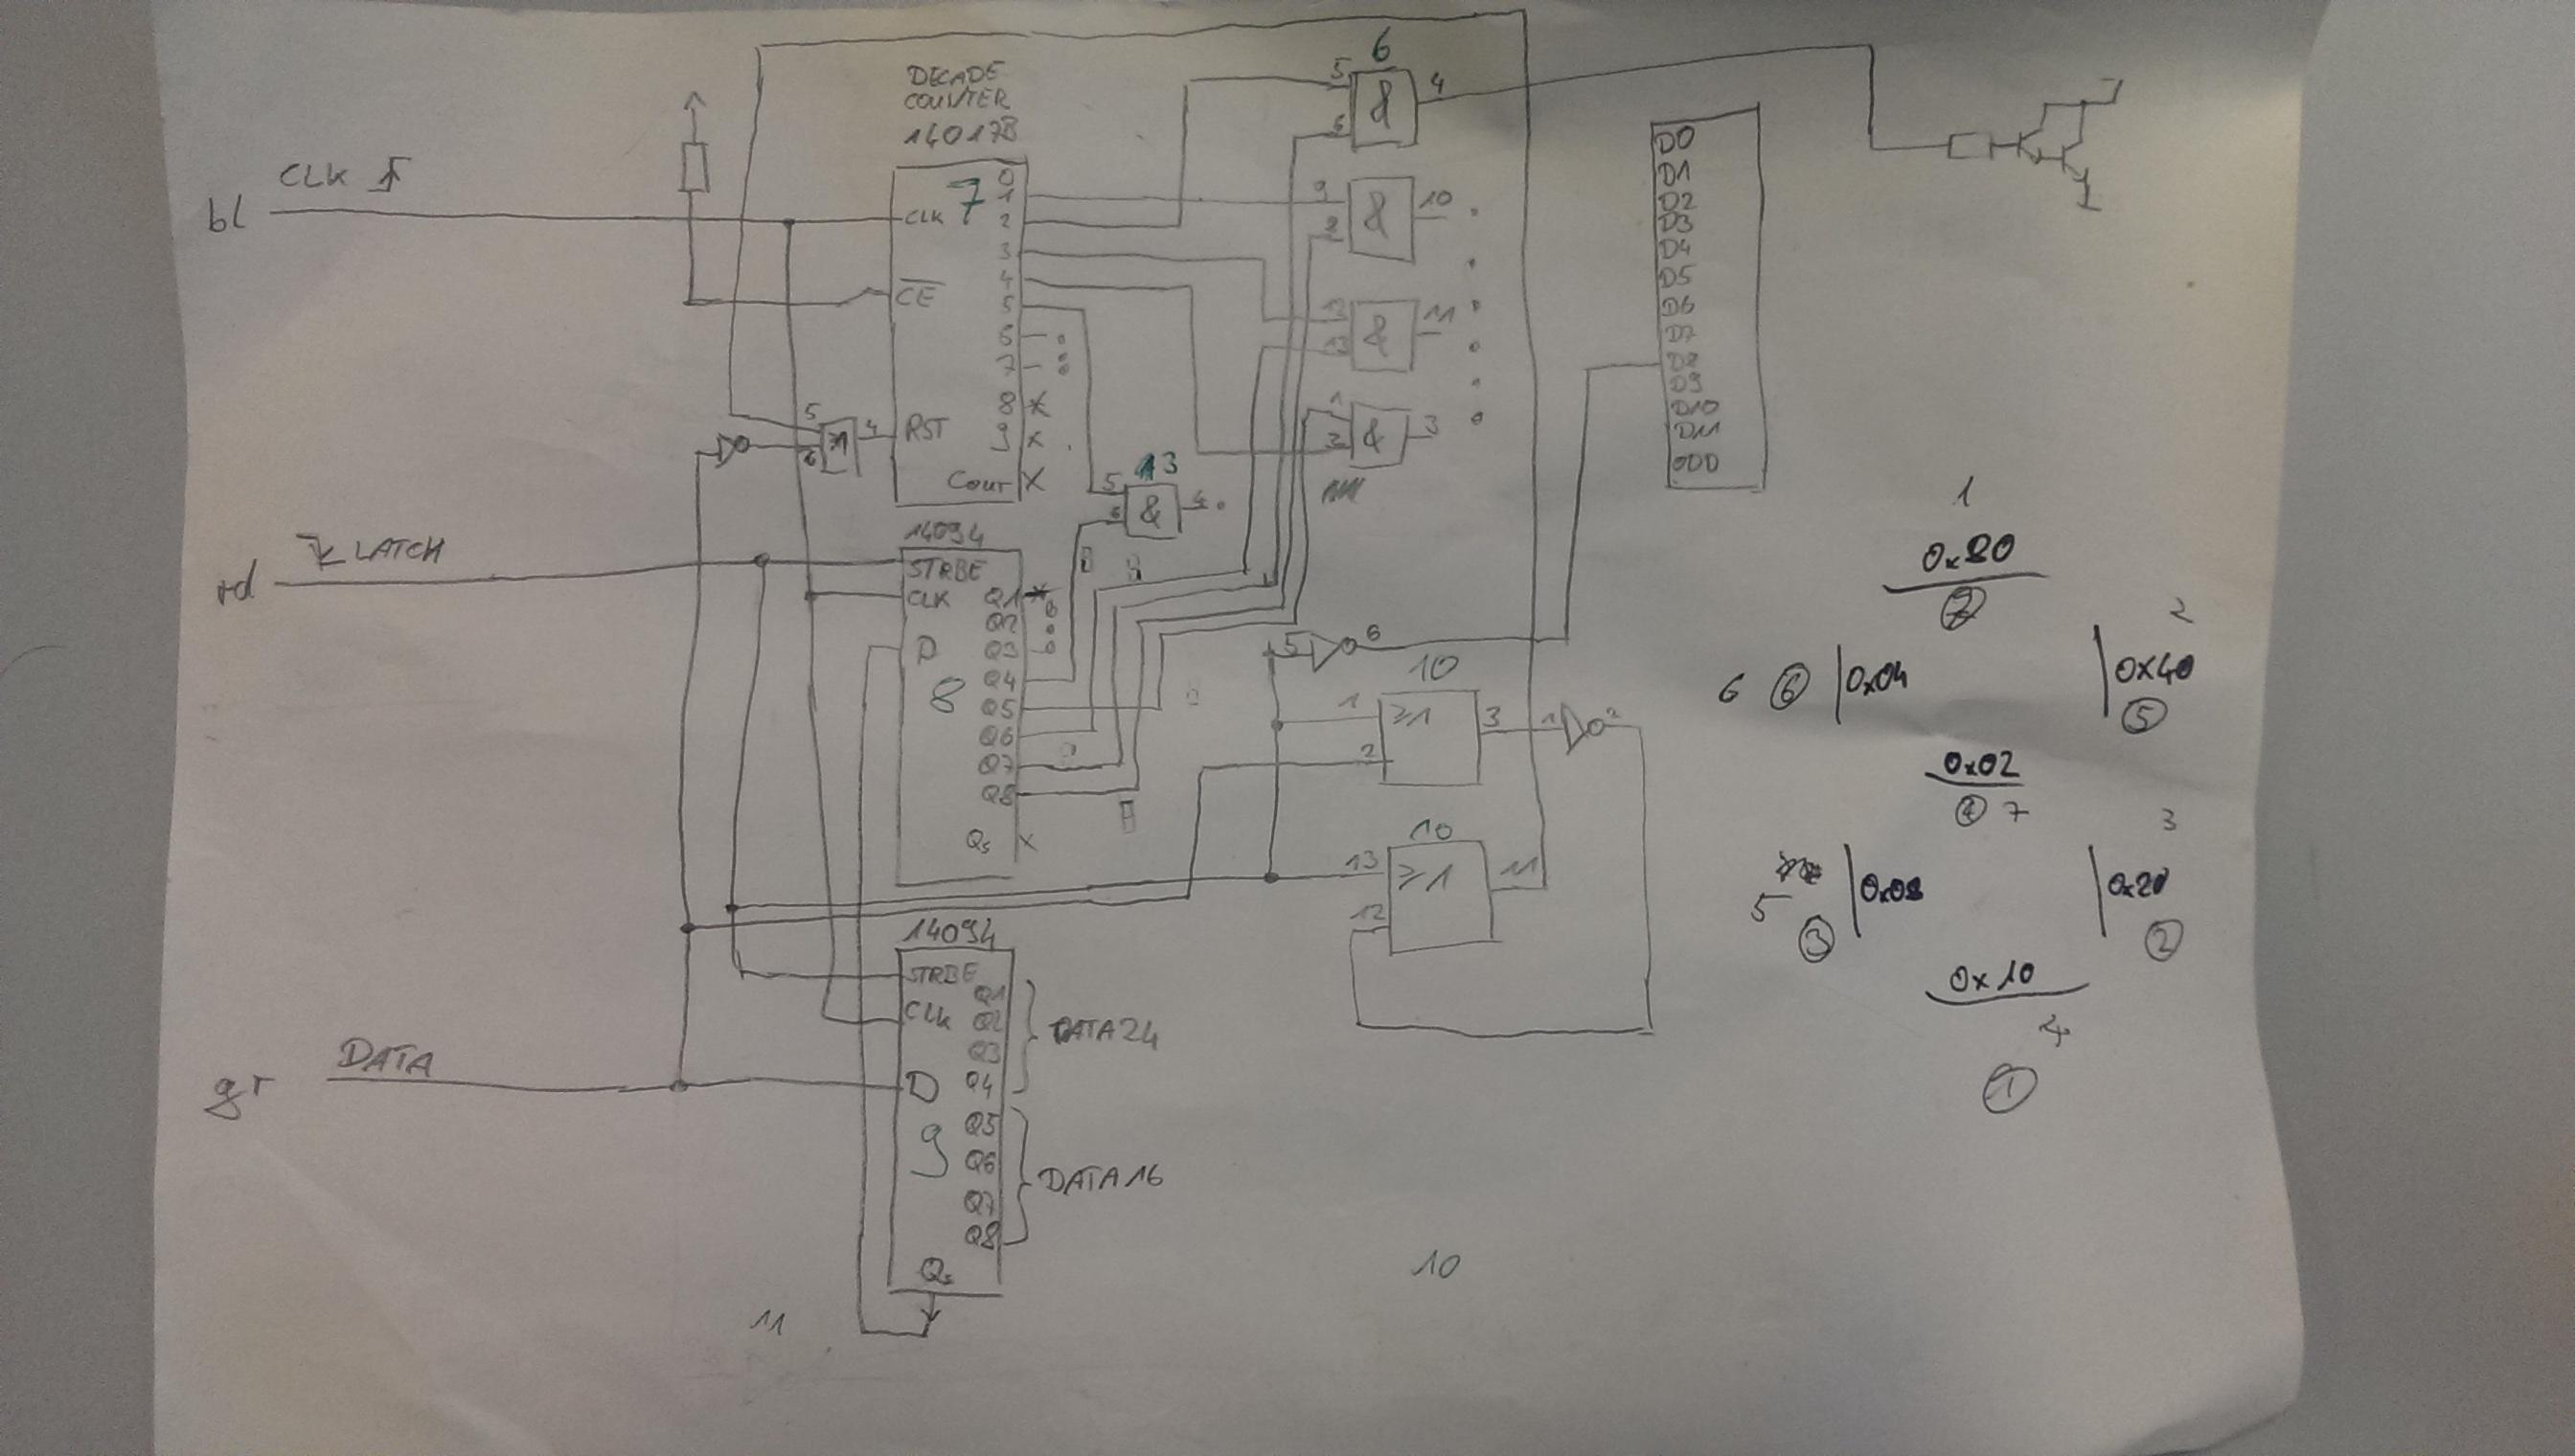 Mechanisches 7-Segment Display – 42Volt